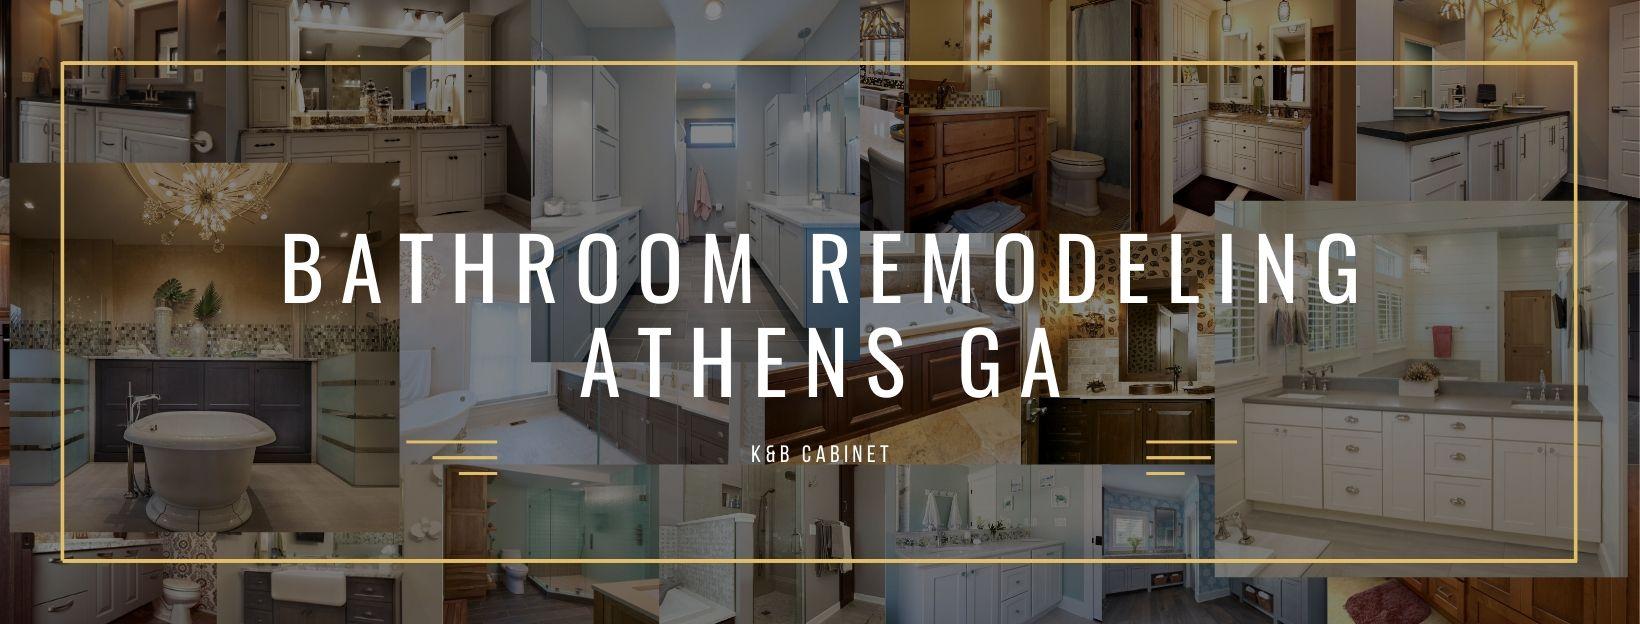 Bathroom Remodeling Athens GA